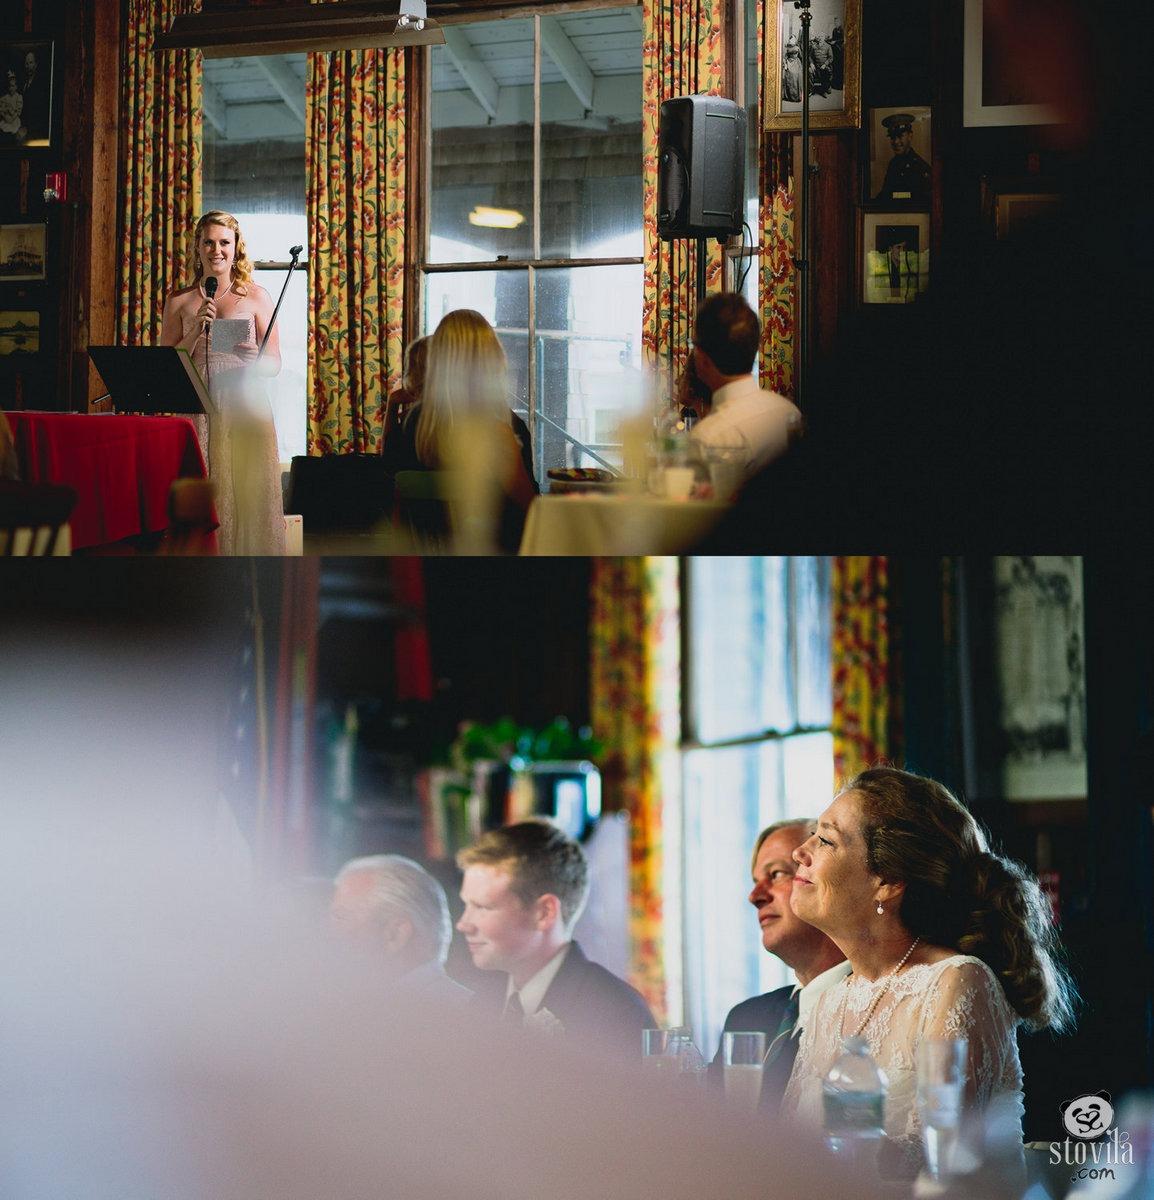 Peak_Island_Maine_Wedding_Jeff_&_Joanie_Stovila (12)